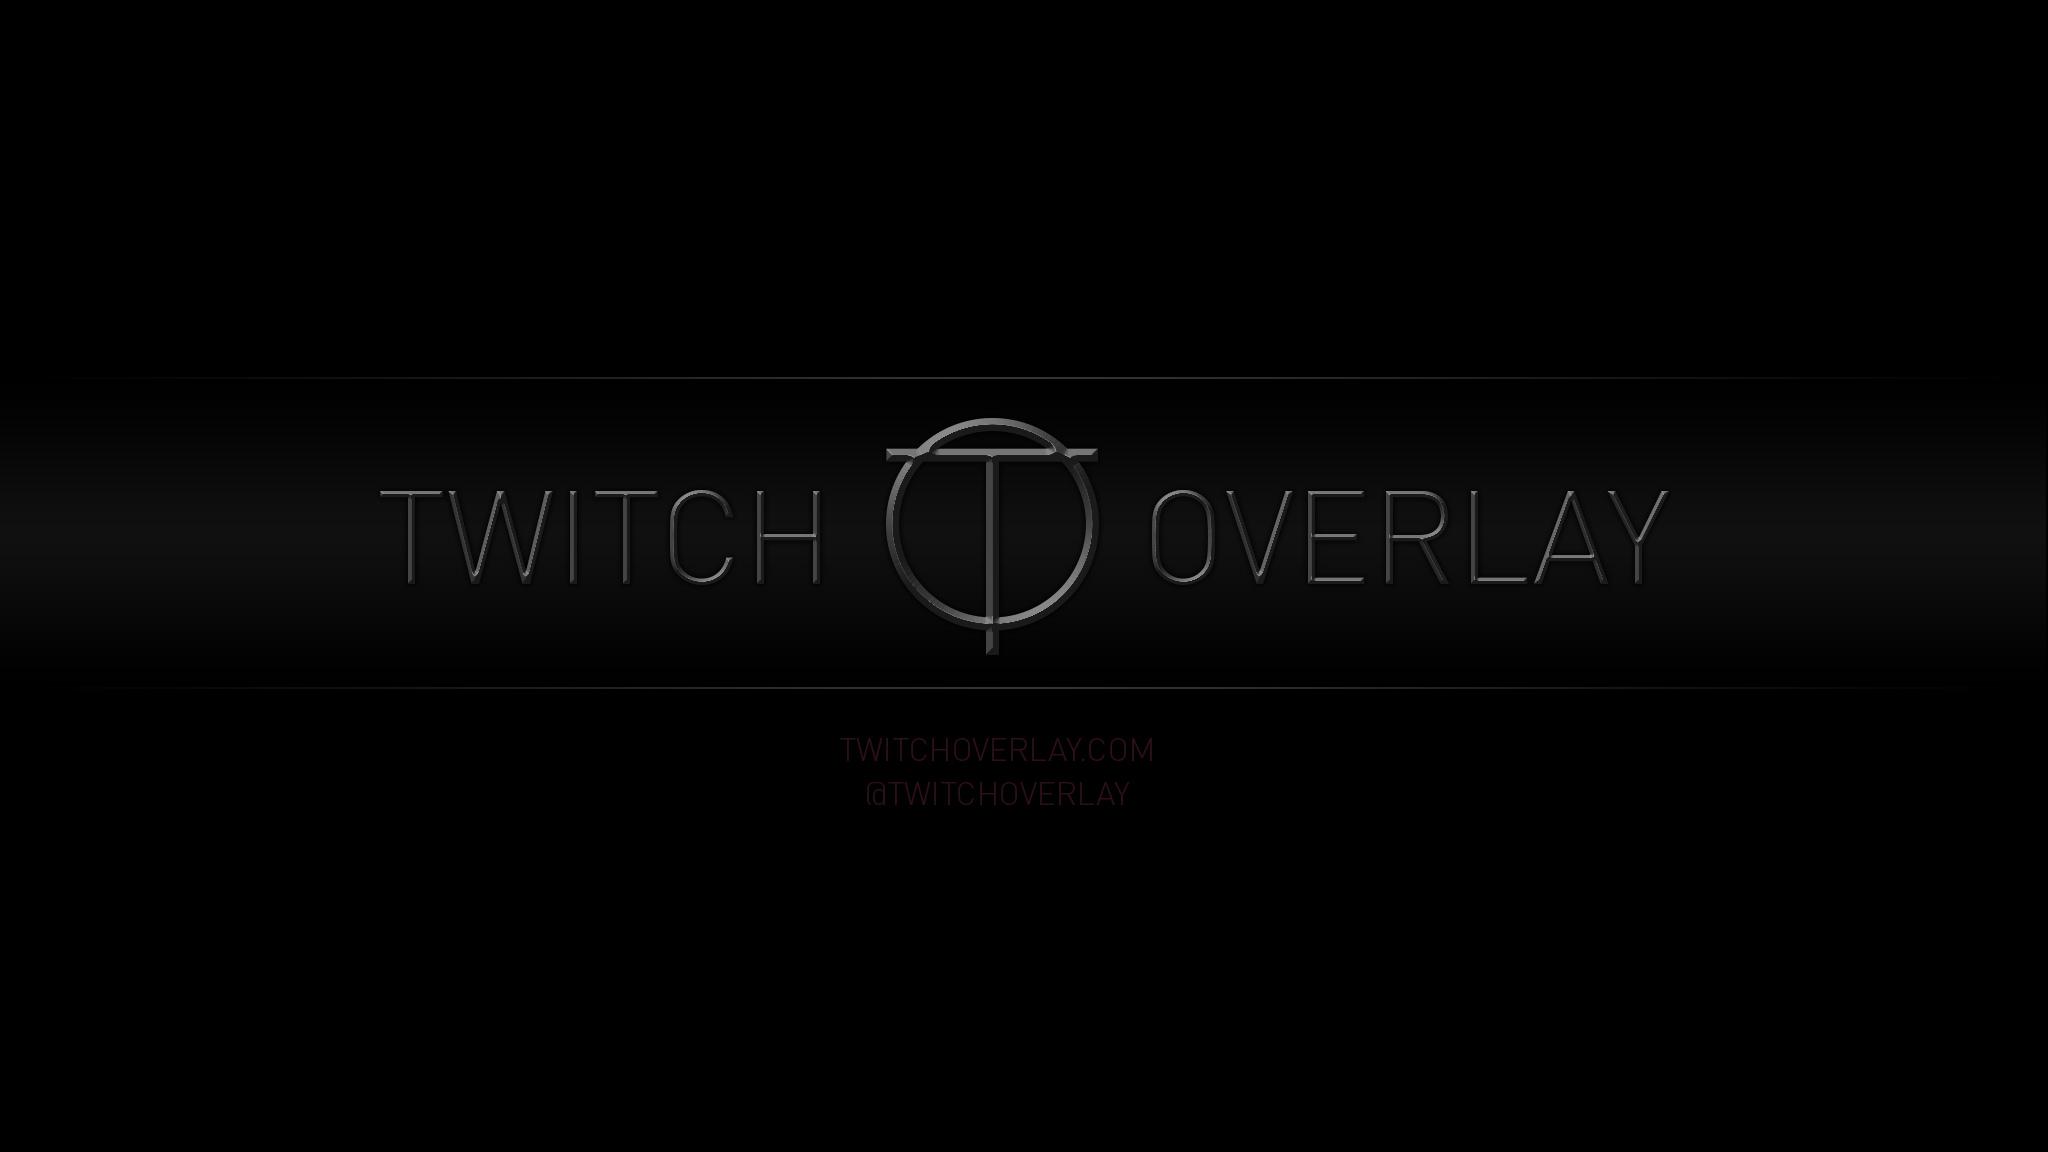 - Twitch Overlay